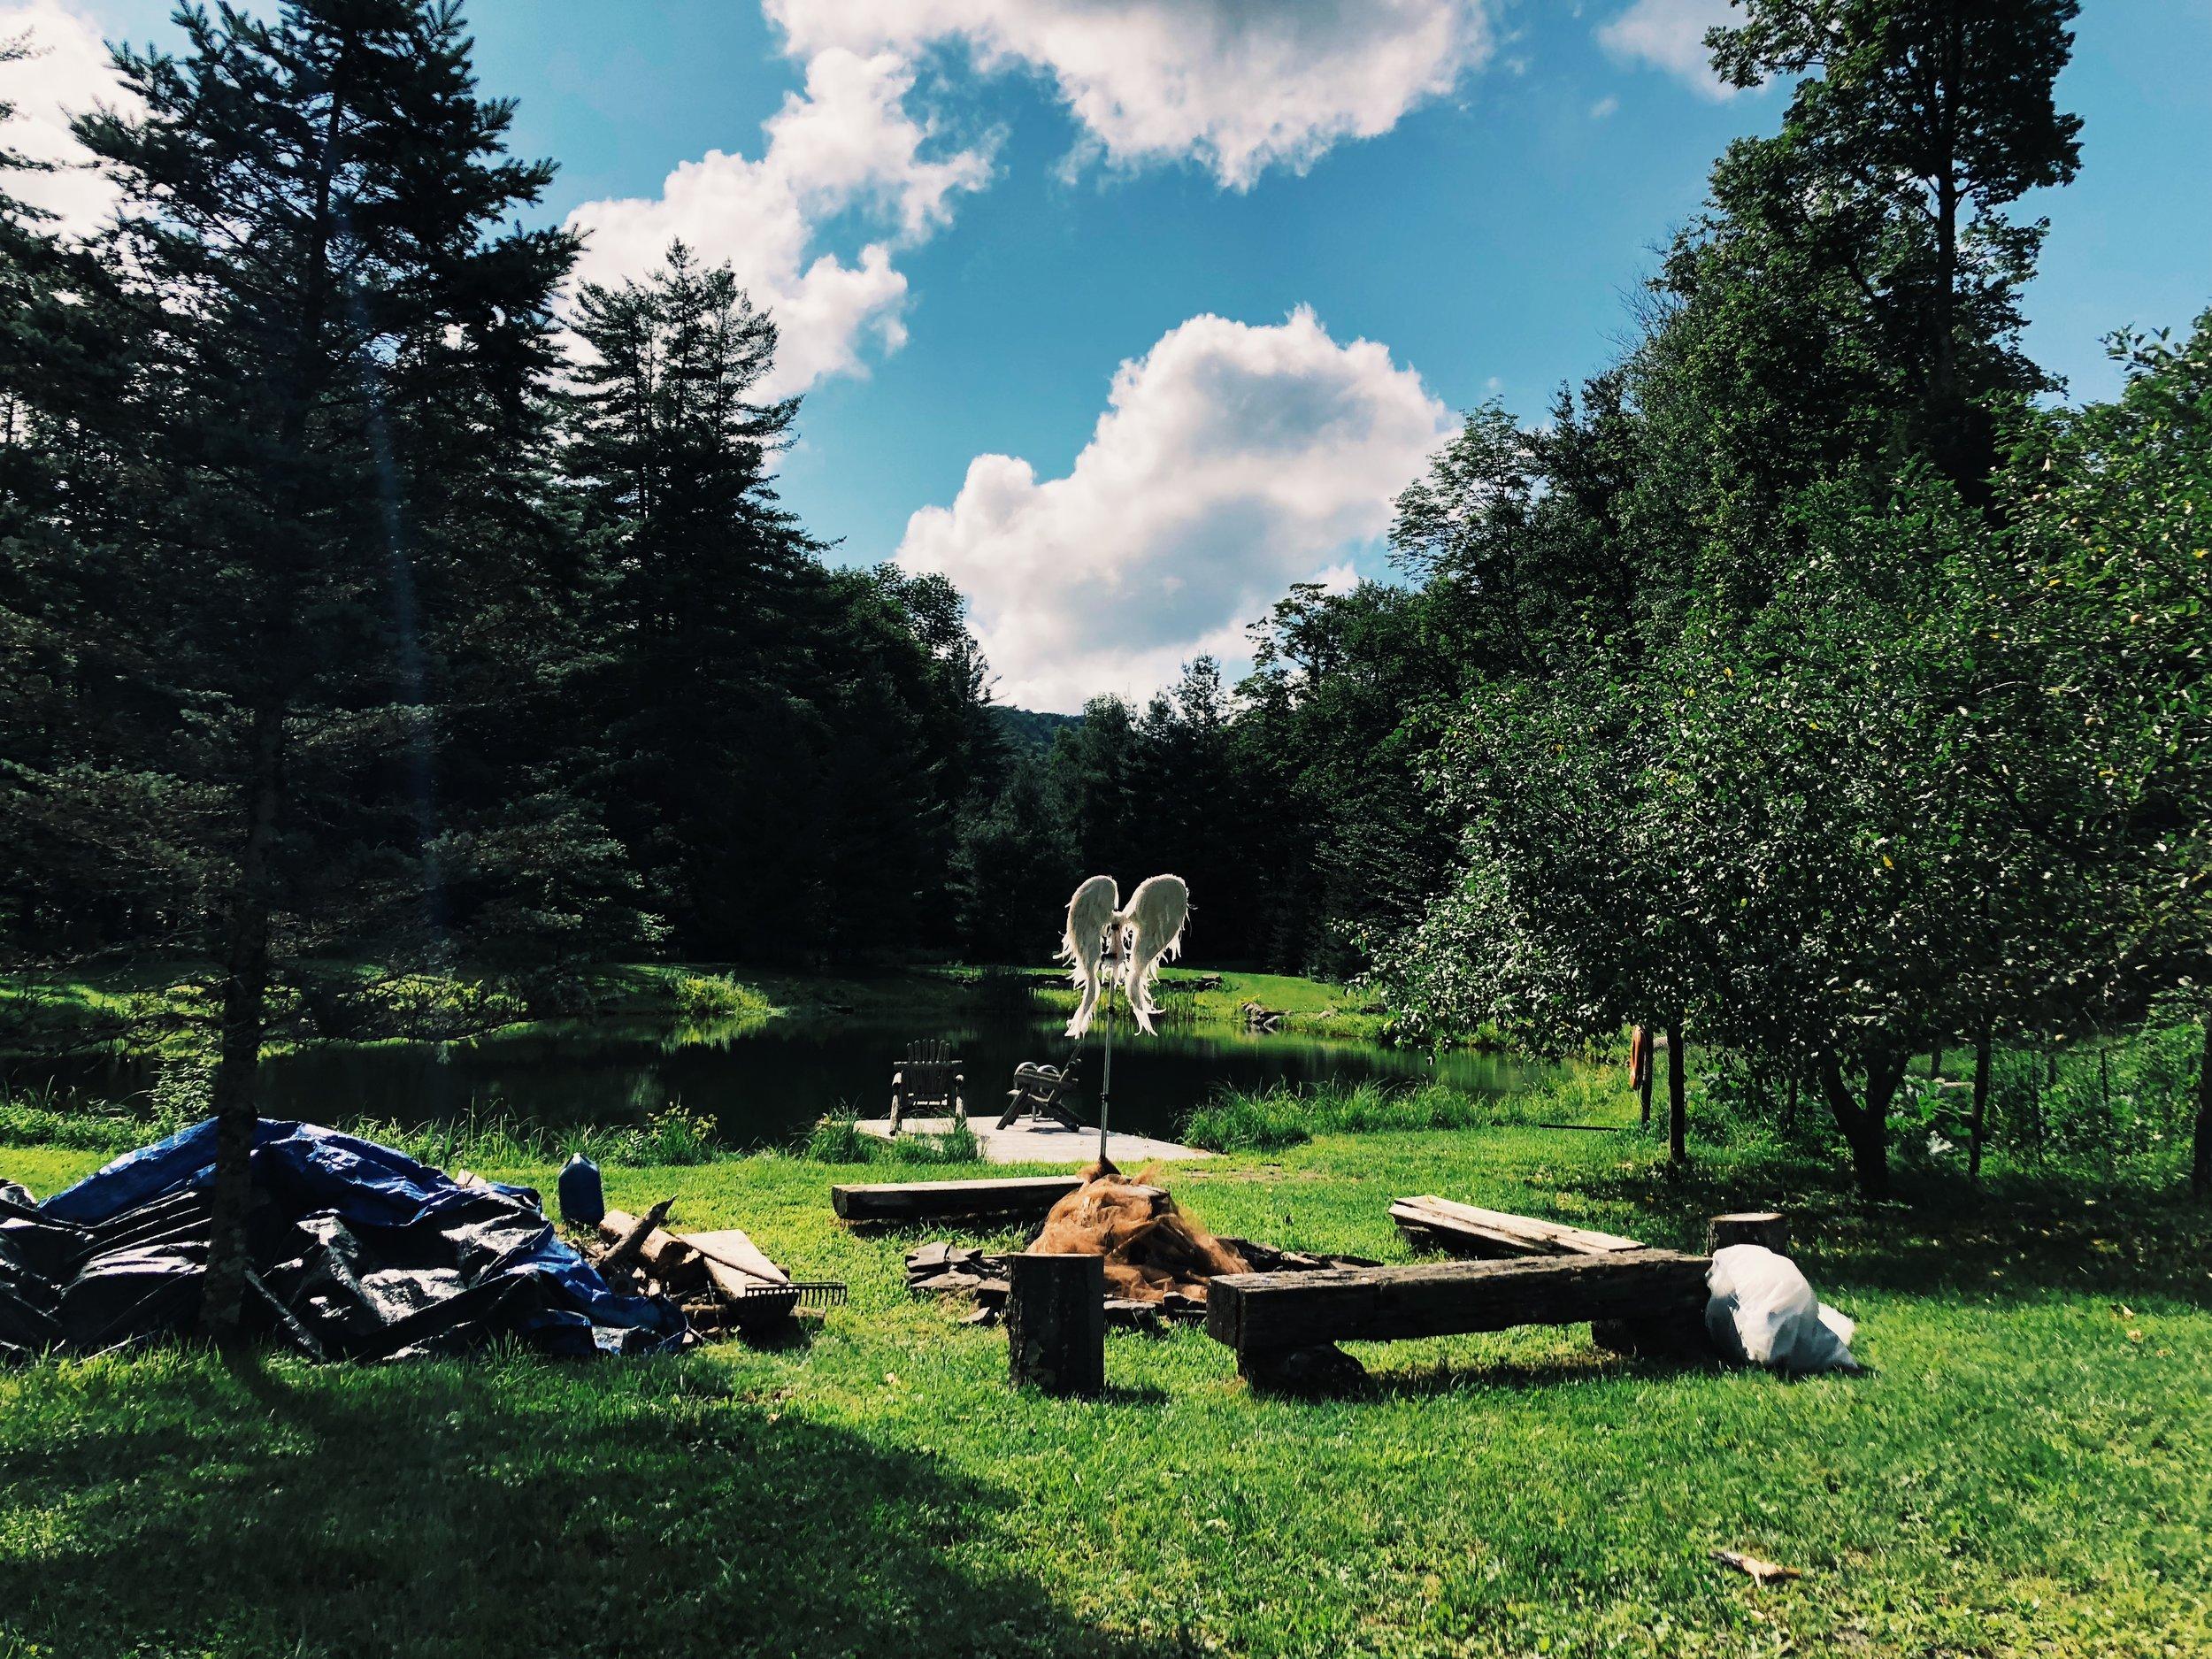 2017 Holz/Weston Workshop at Holz Farm in Phoenicia, NY  Photo by Annabelle Scott